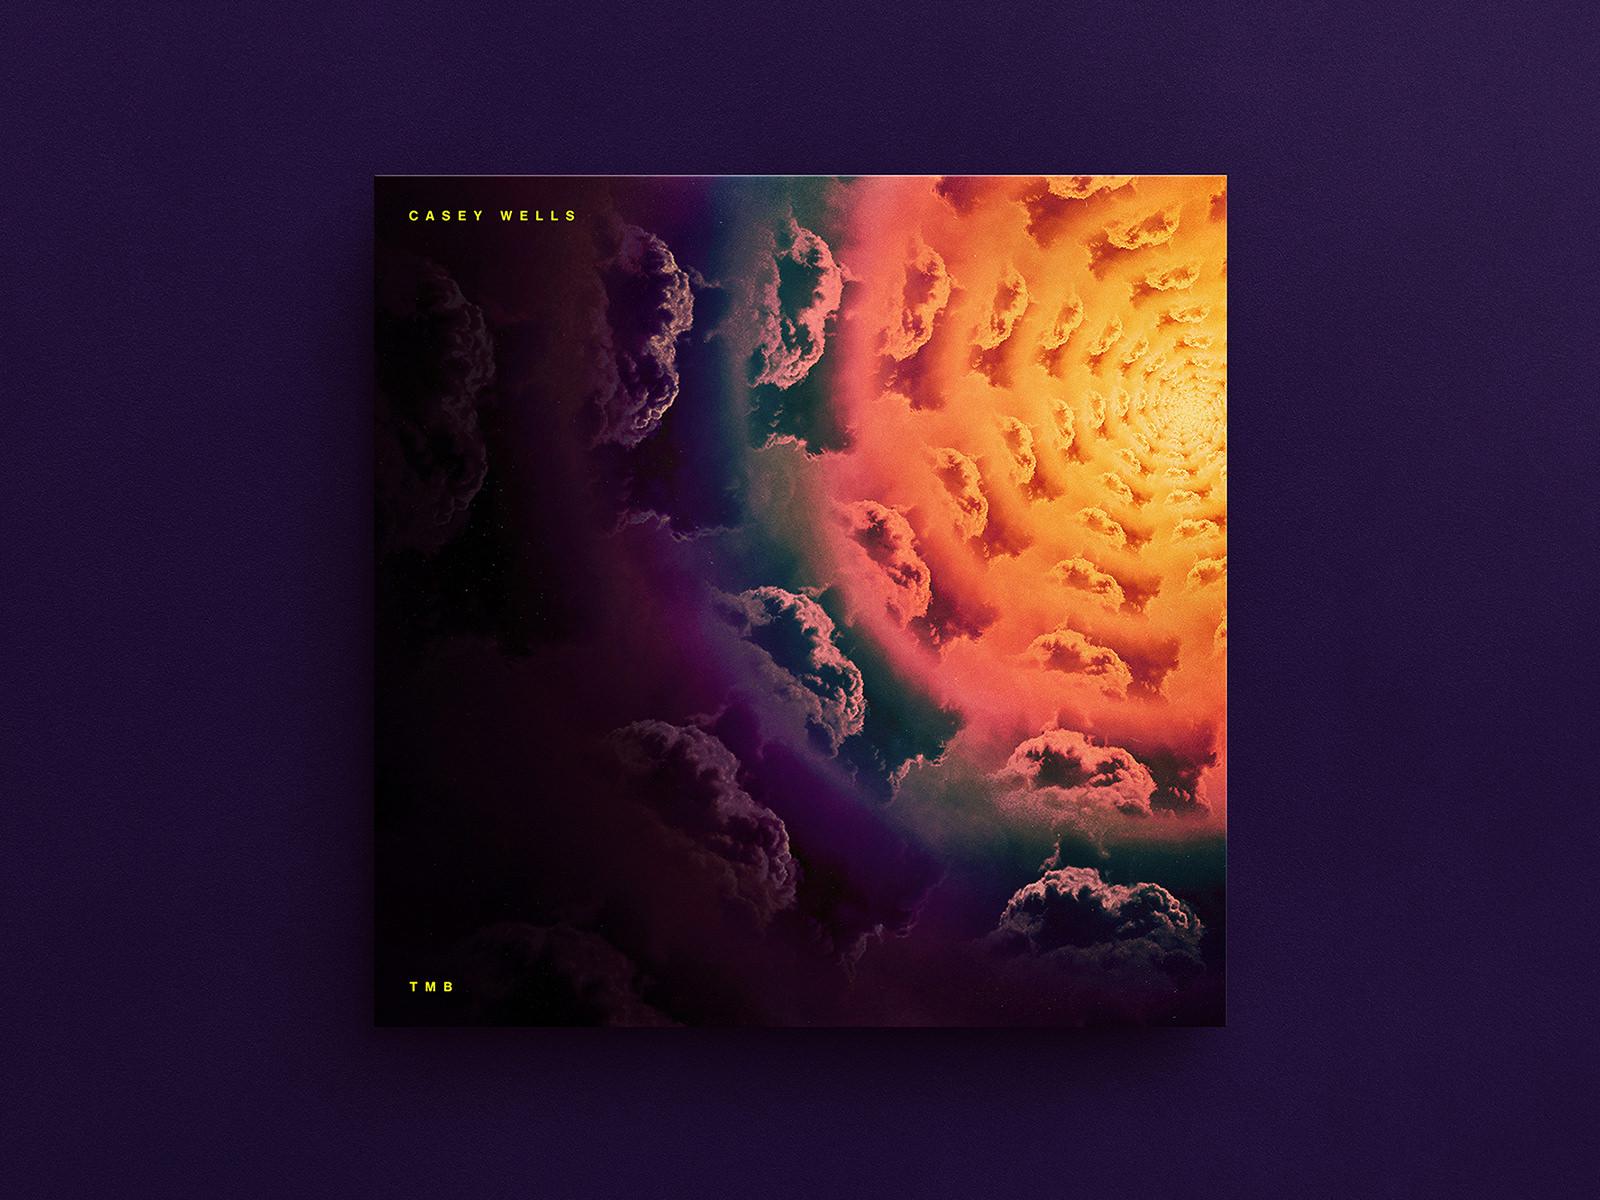 TMB Album Cover Artwork